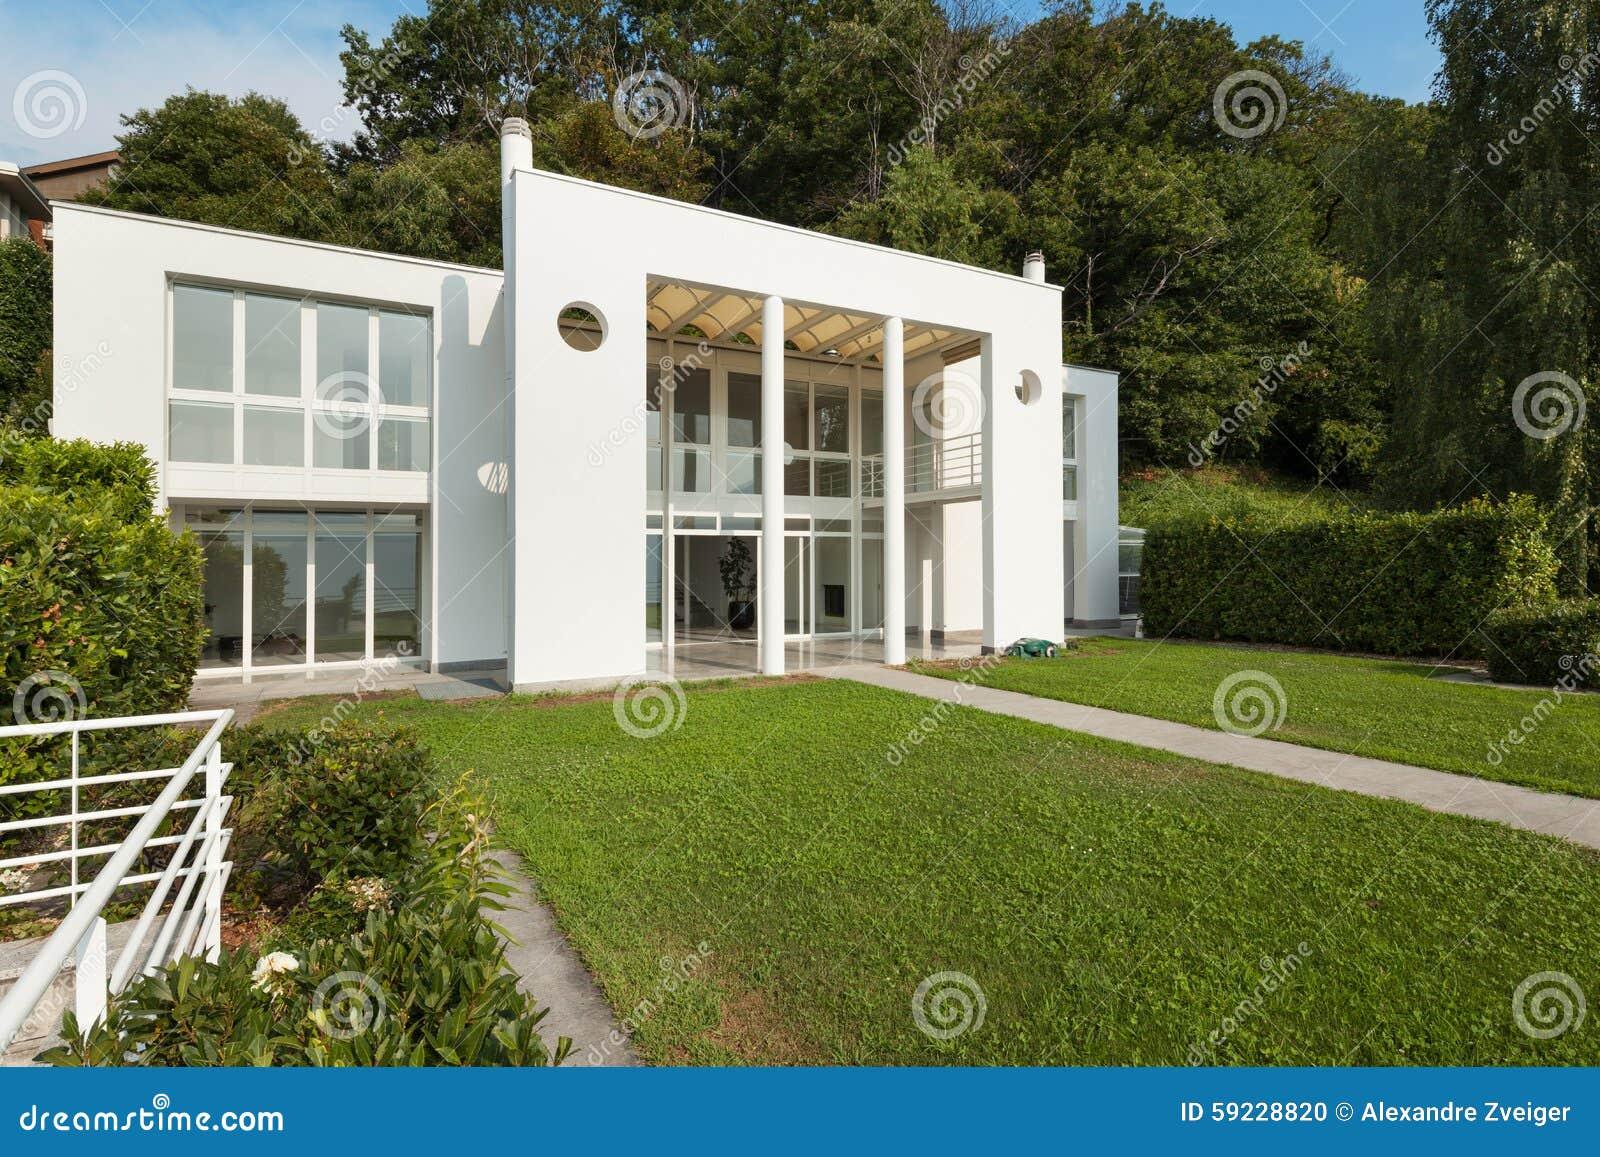 Jardin d 39 une villa moderne blanche photo stock image for Jardin pour villa moderne